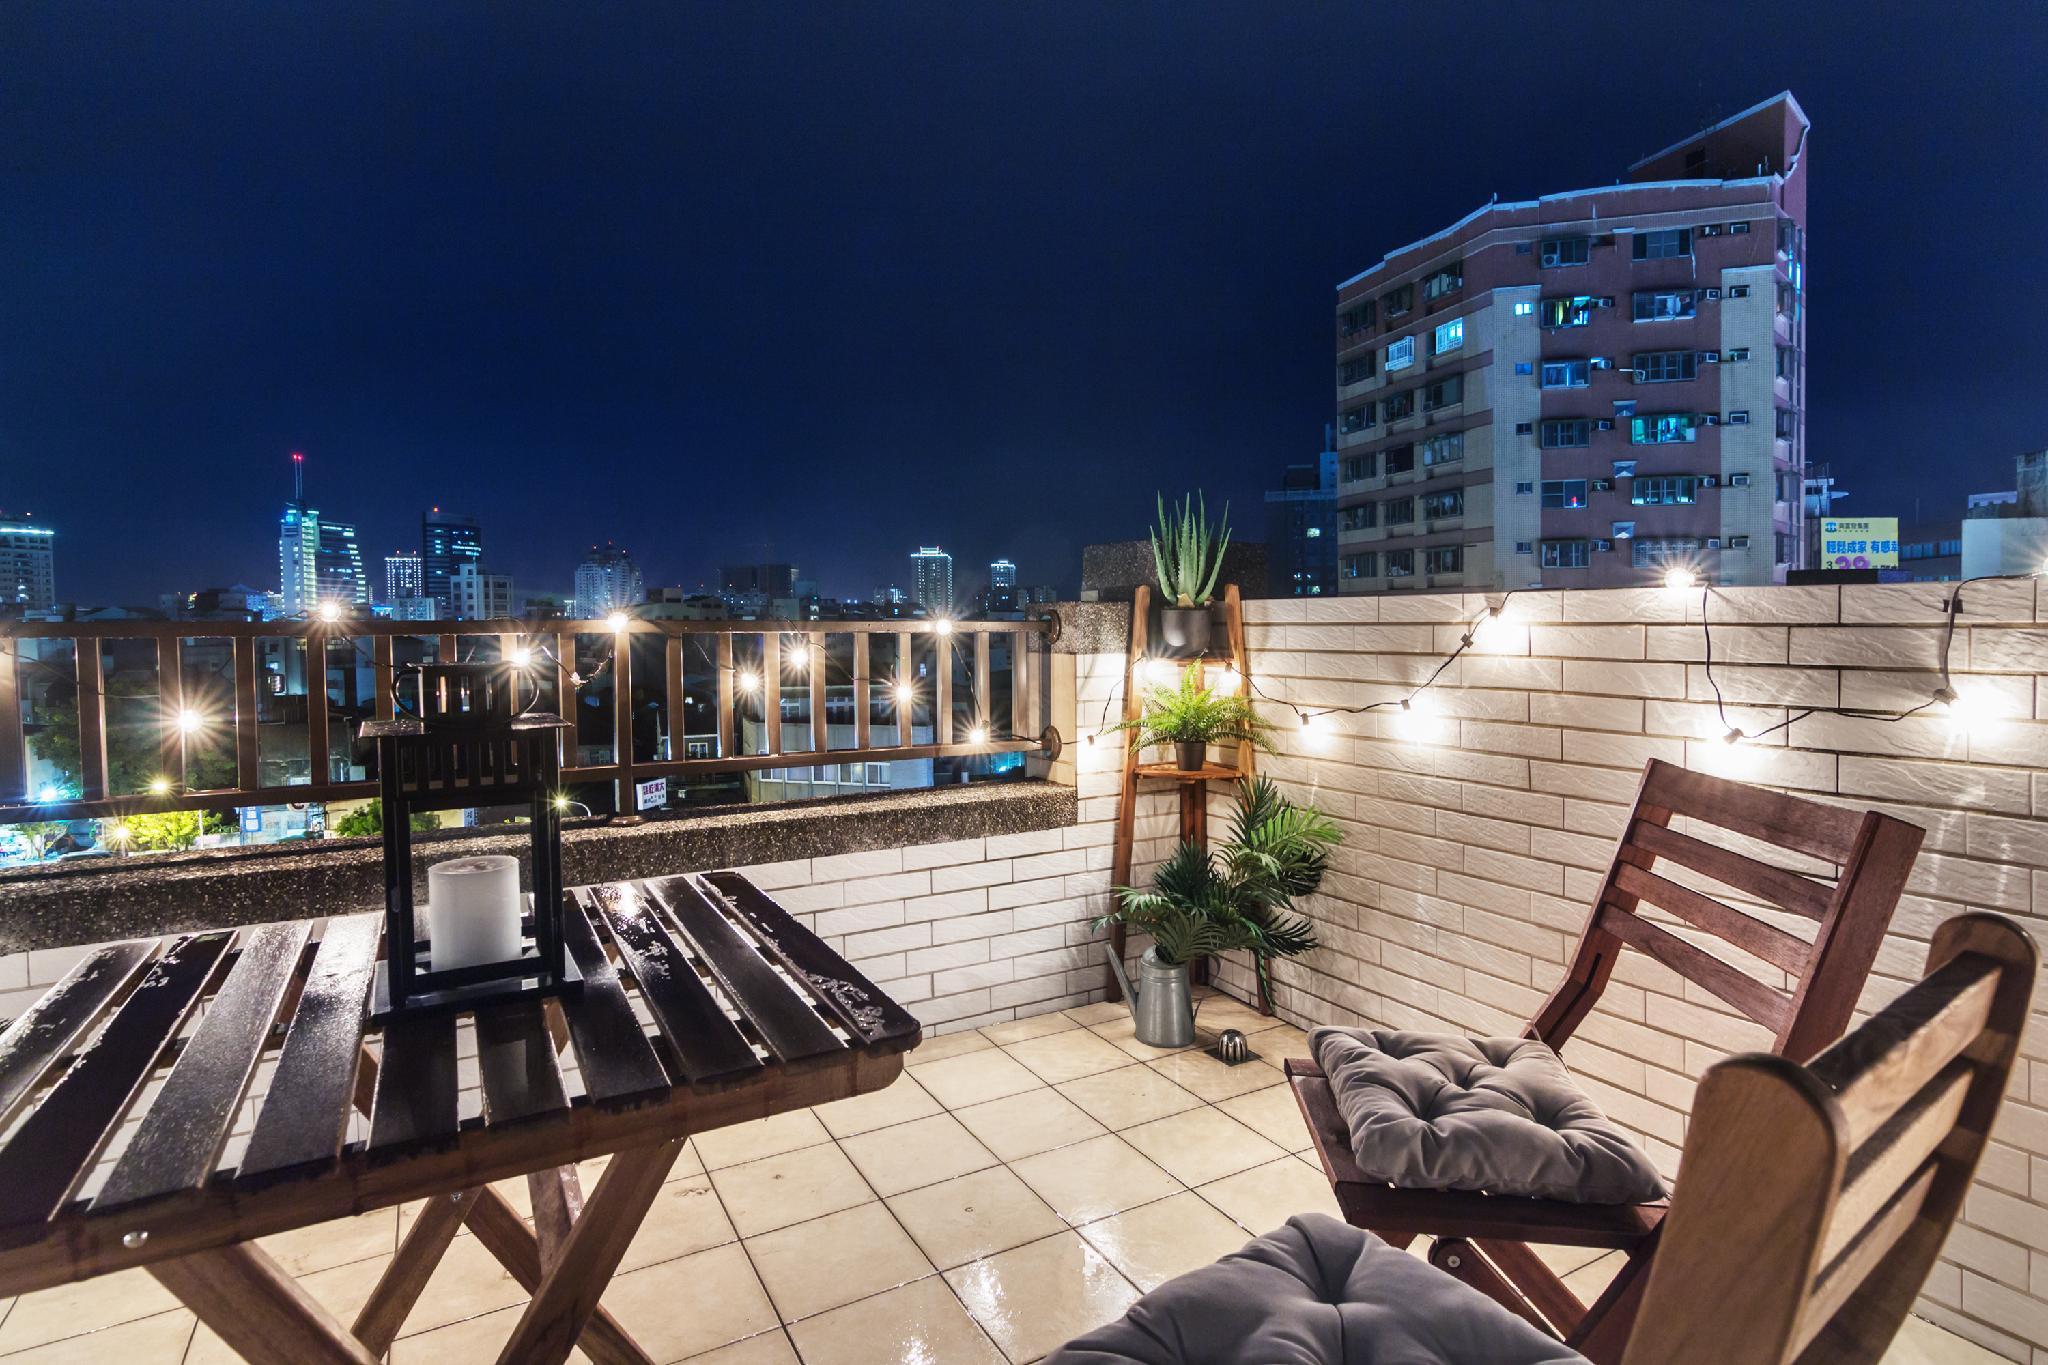 Tainan Haian Art Apartment